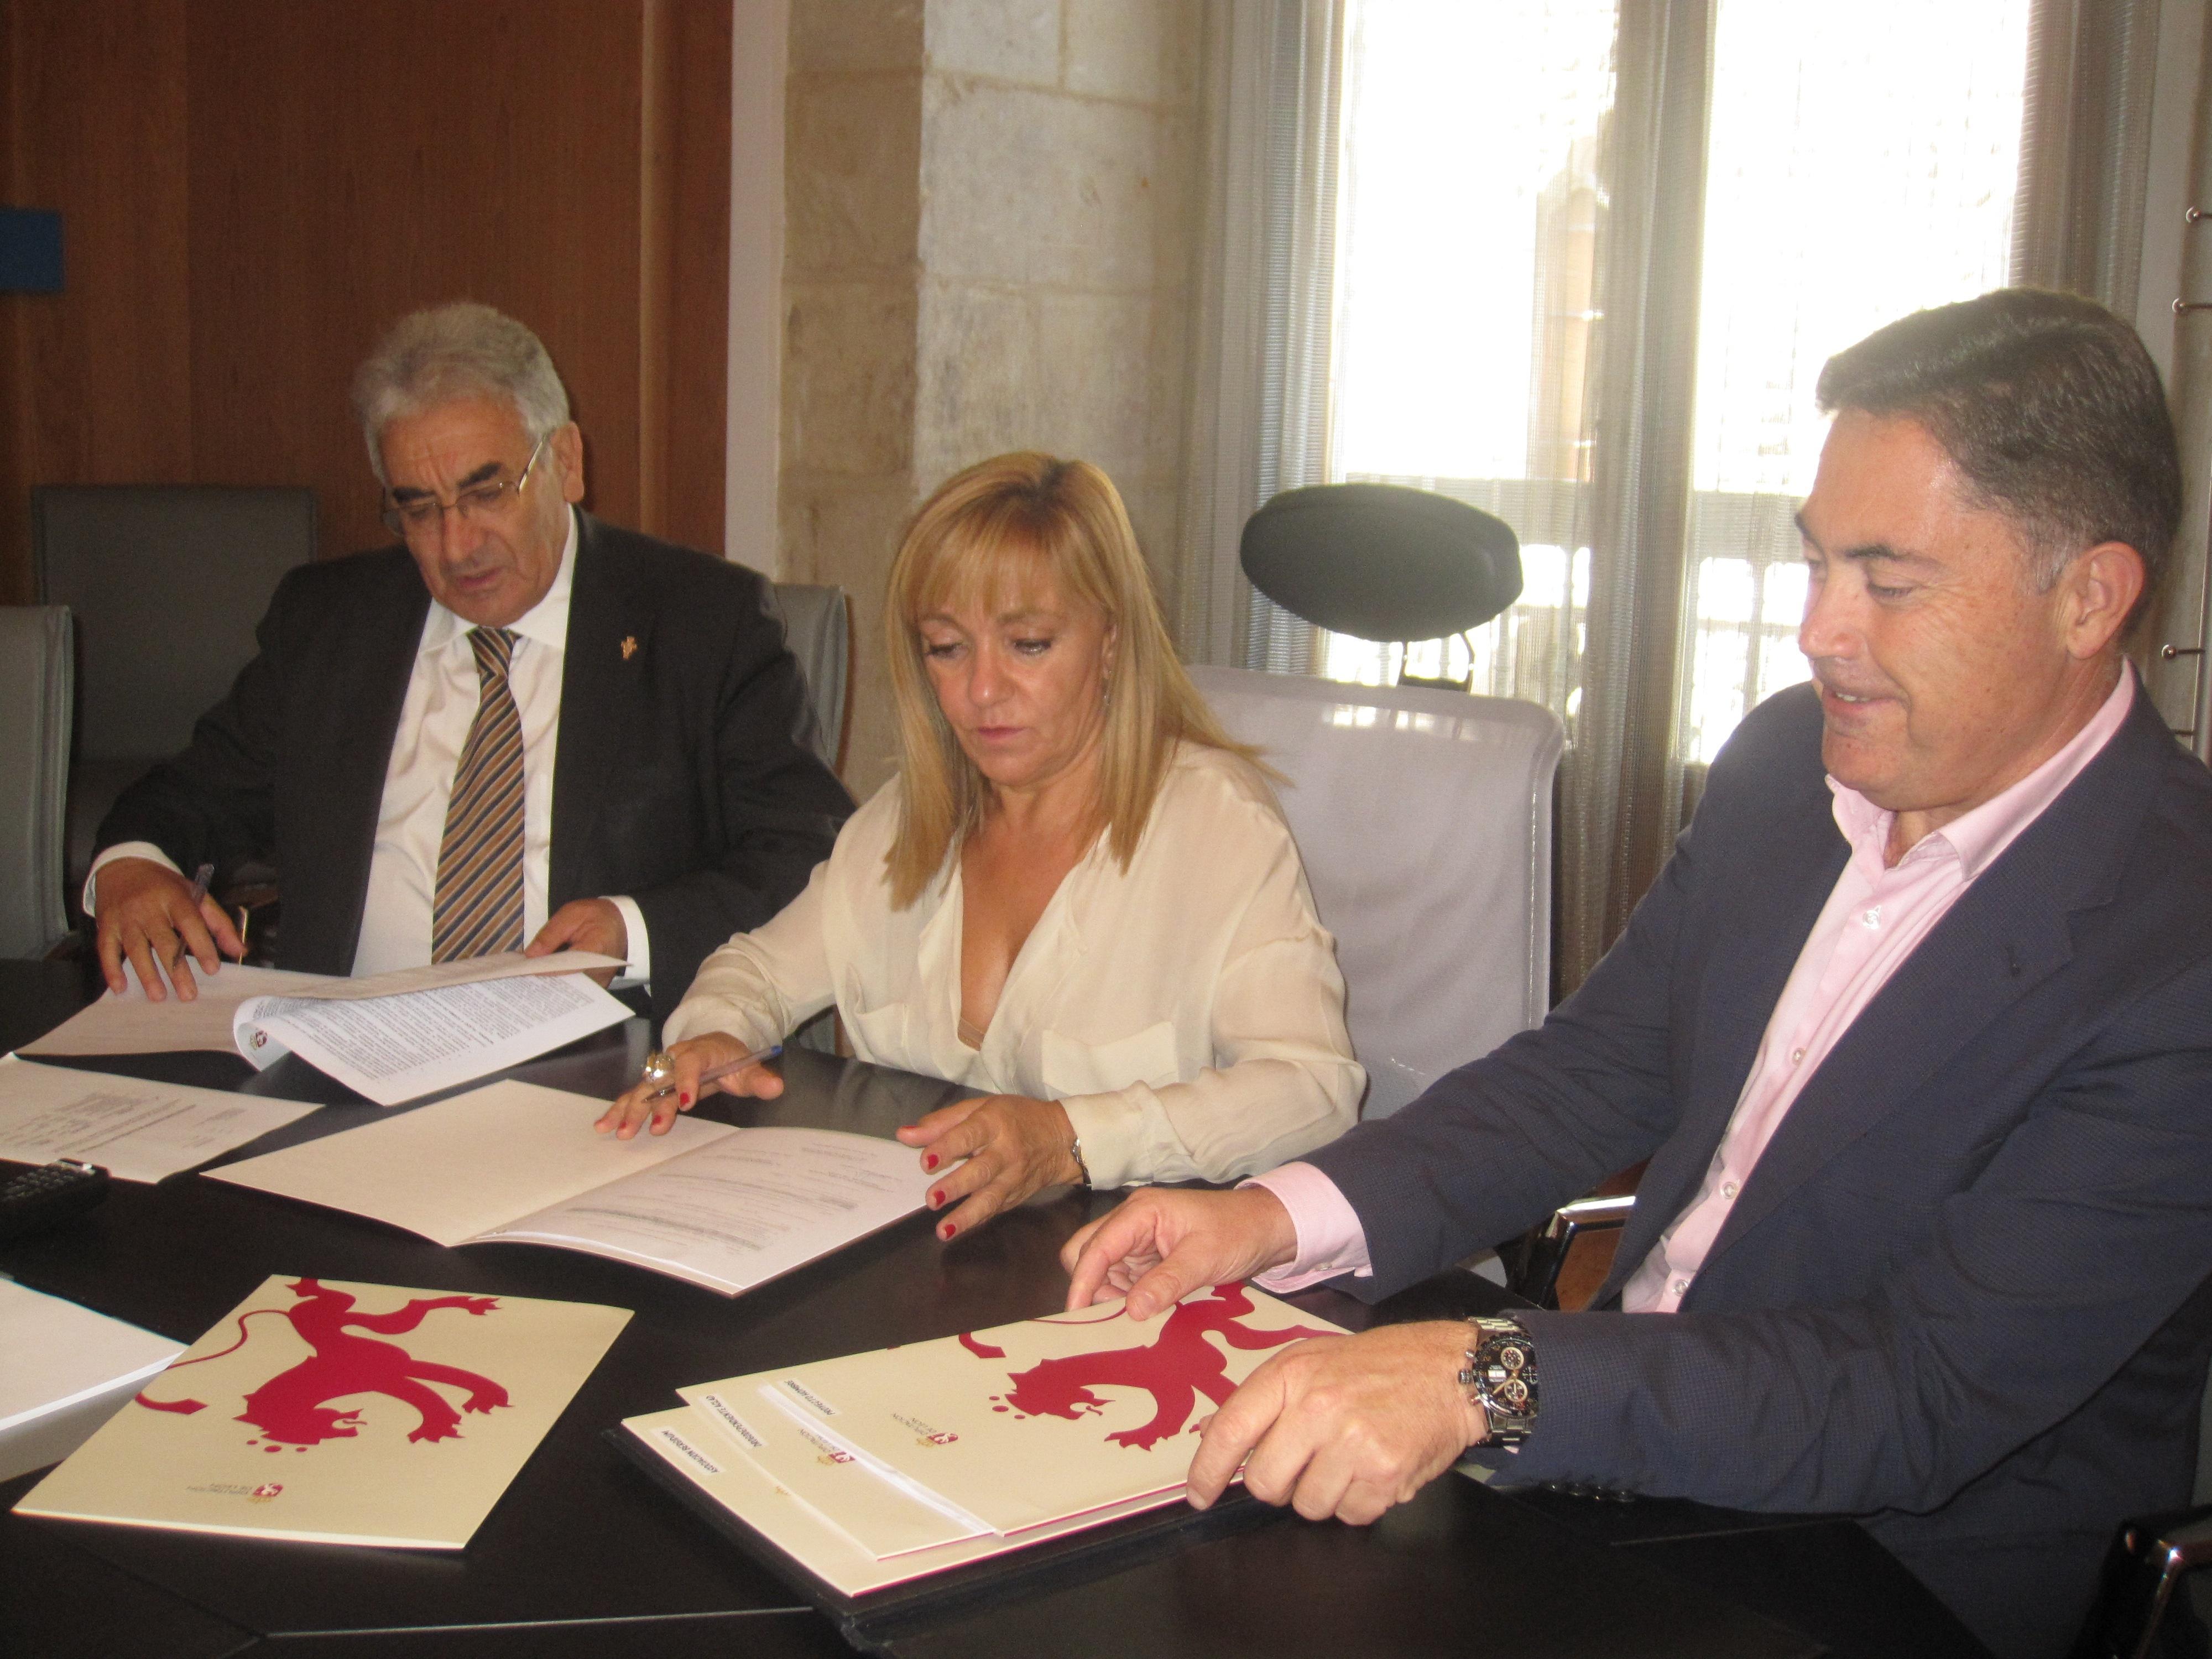 La Diputación de León destina 9.000 a la Fundación Secretariado Gitano para realizar actividades de integración